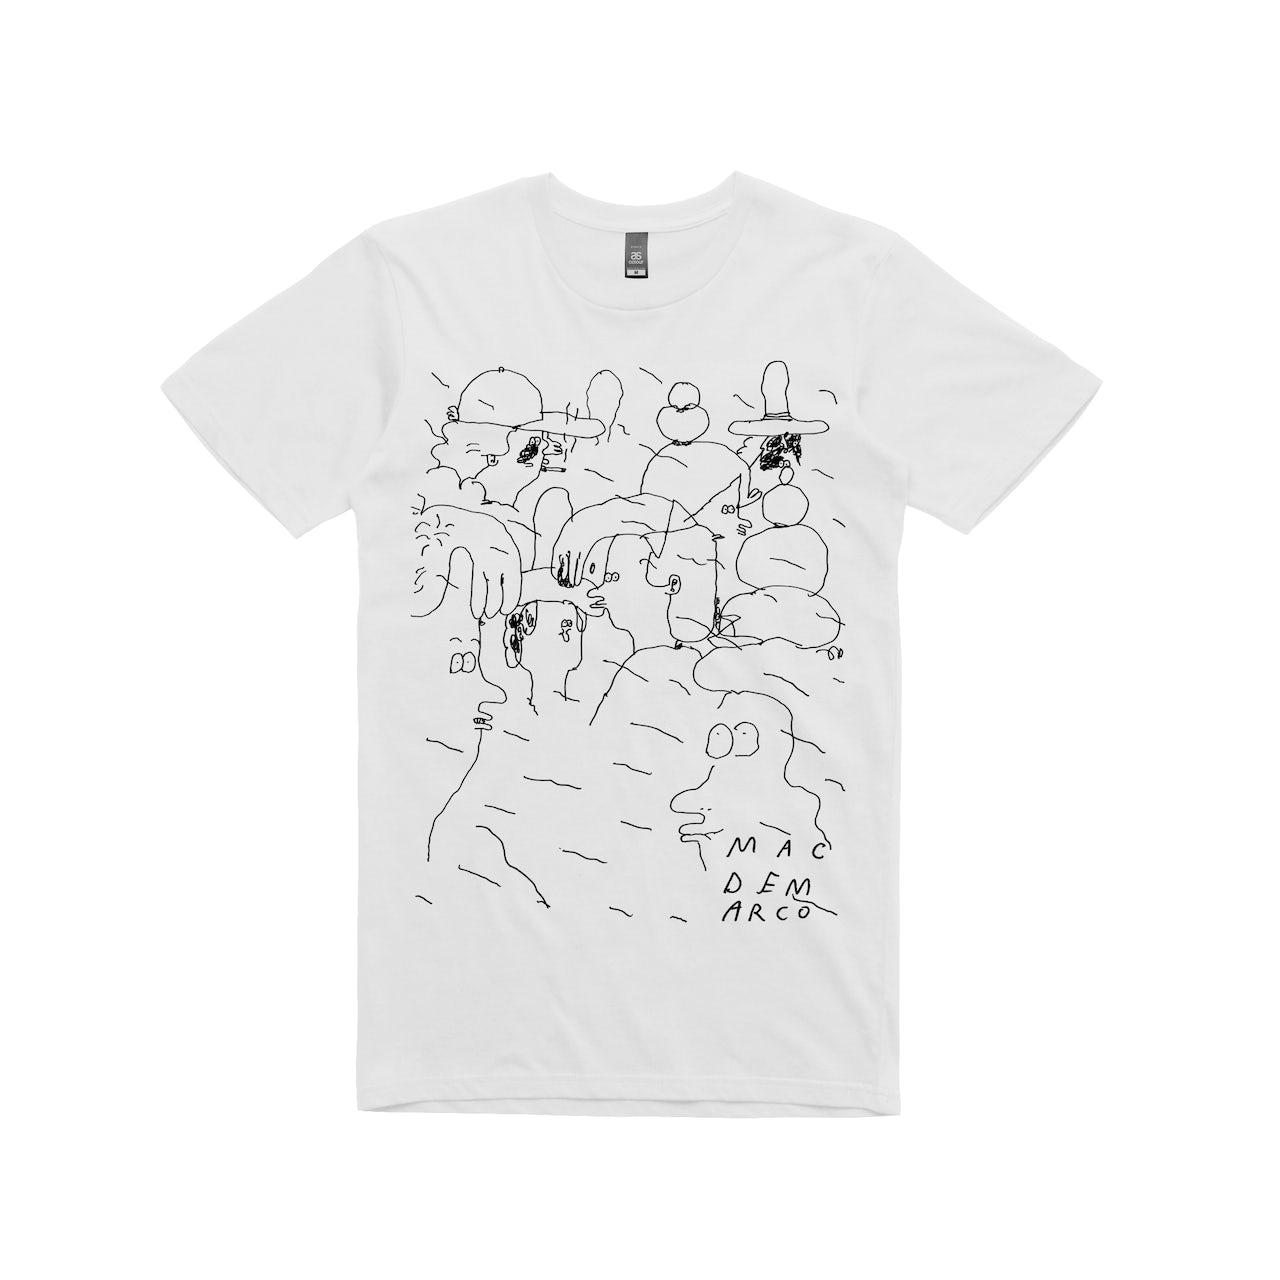 Doodle T Demarco Shirt Mac White People 80vOmnwN